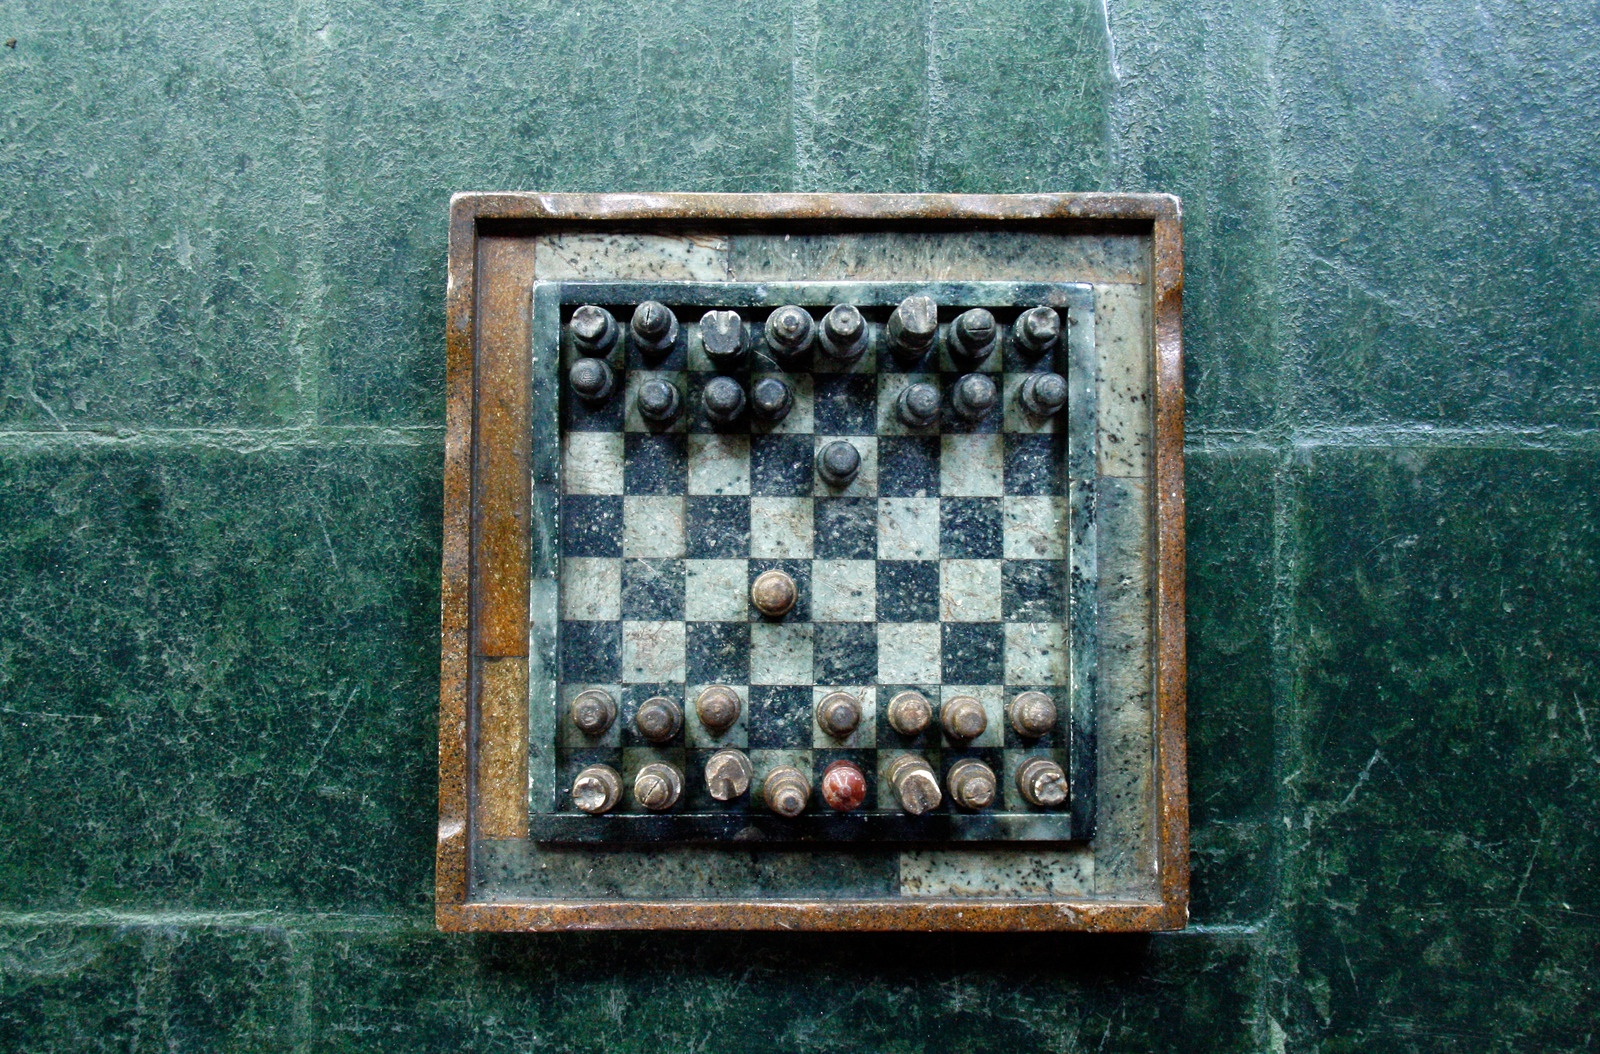 Foto von Claire Thibault: https://www.canva.com/photos/MADGyFYV_jI-chessboard-on-green-surface/